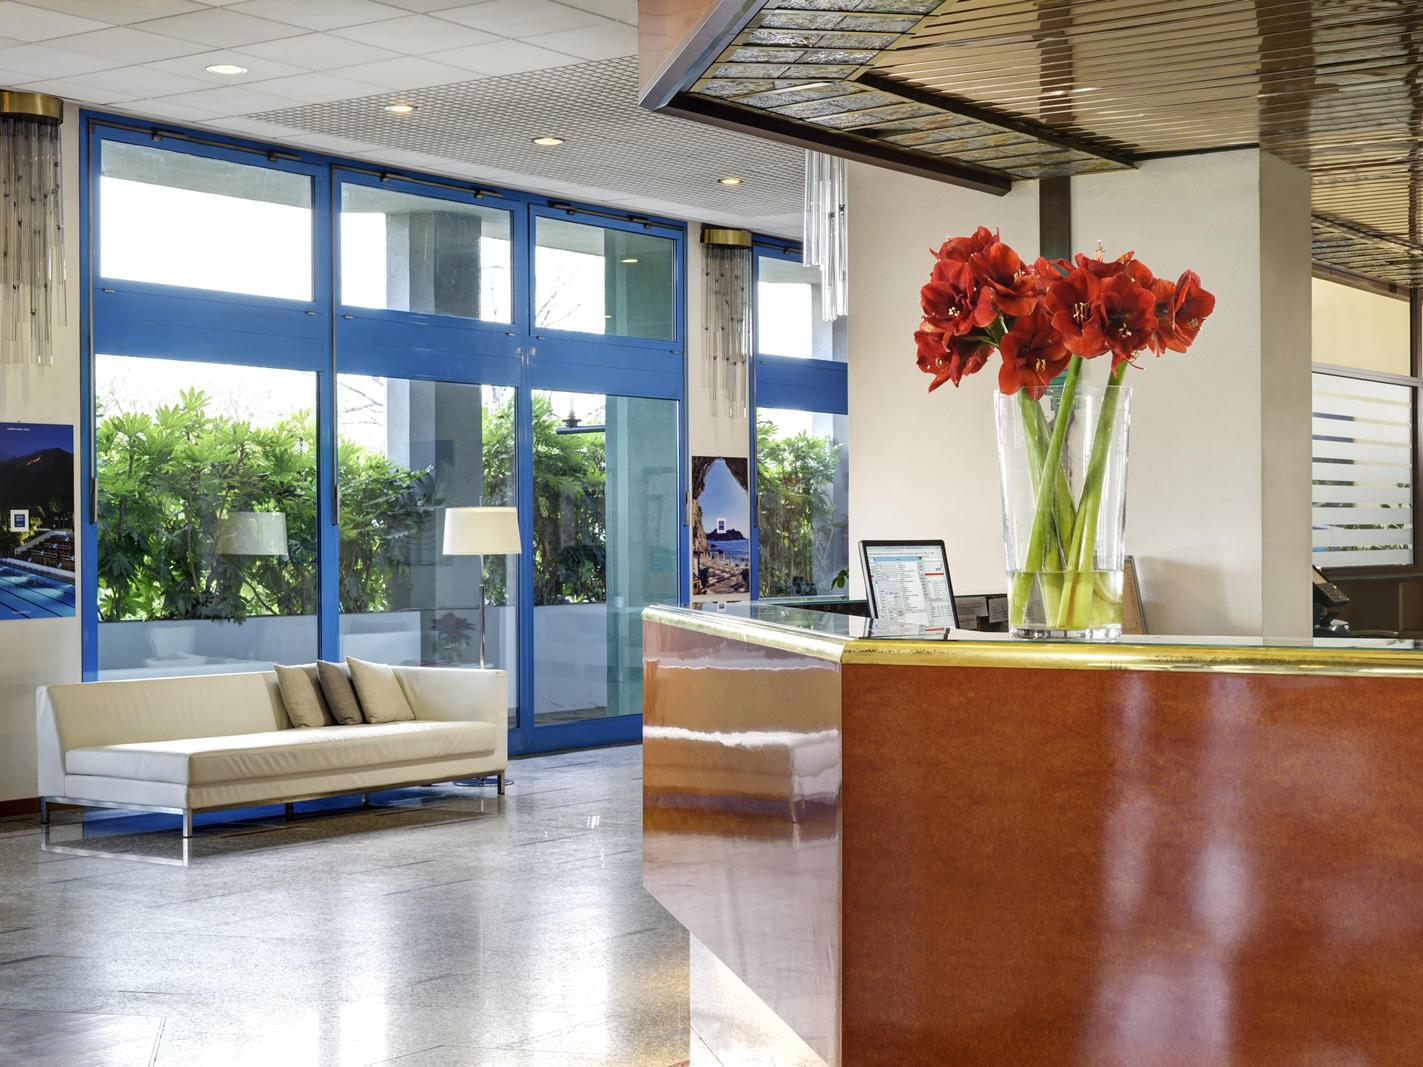 Servizi | Hotels UNAWAY